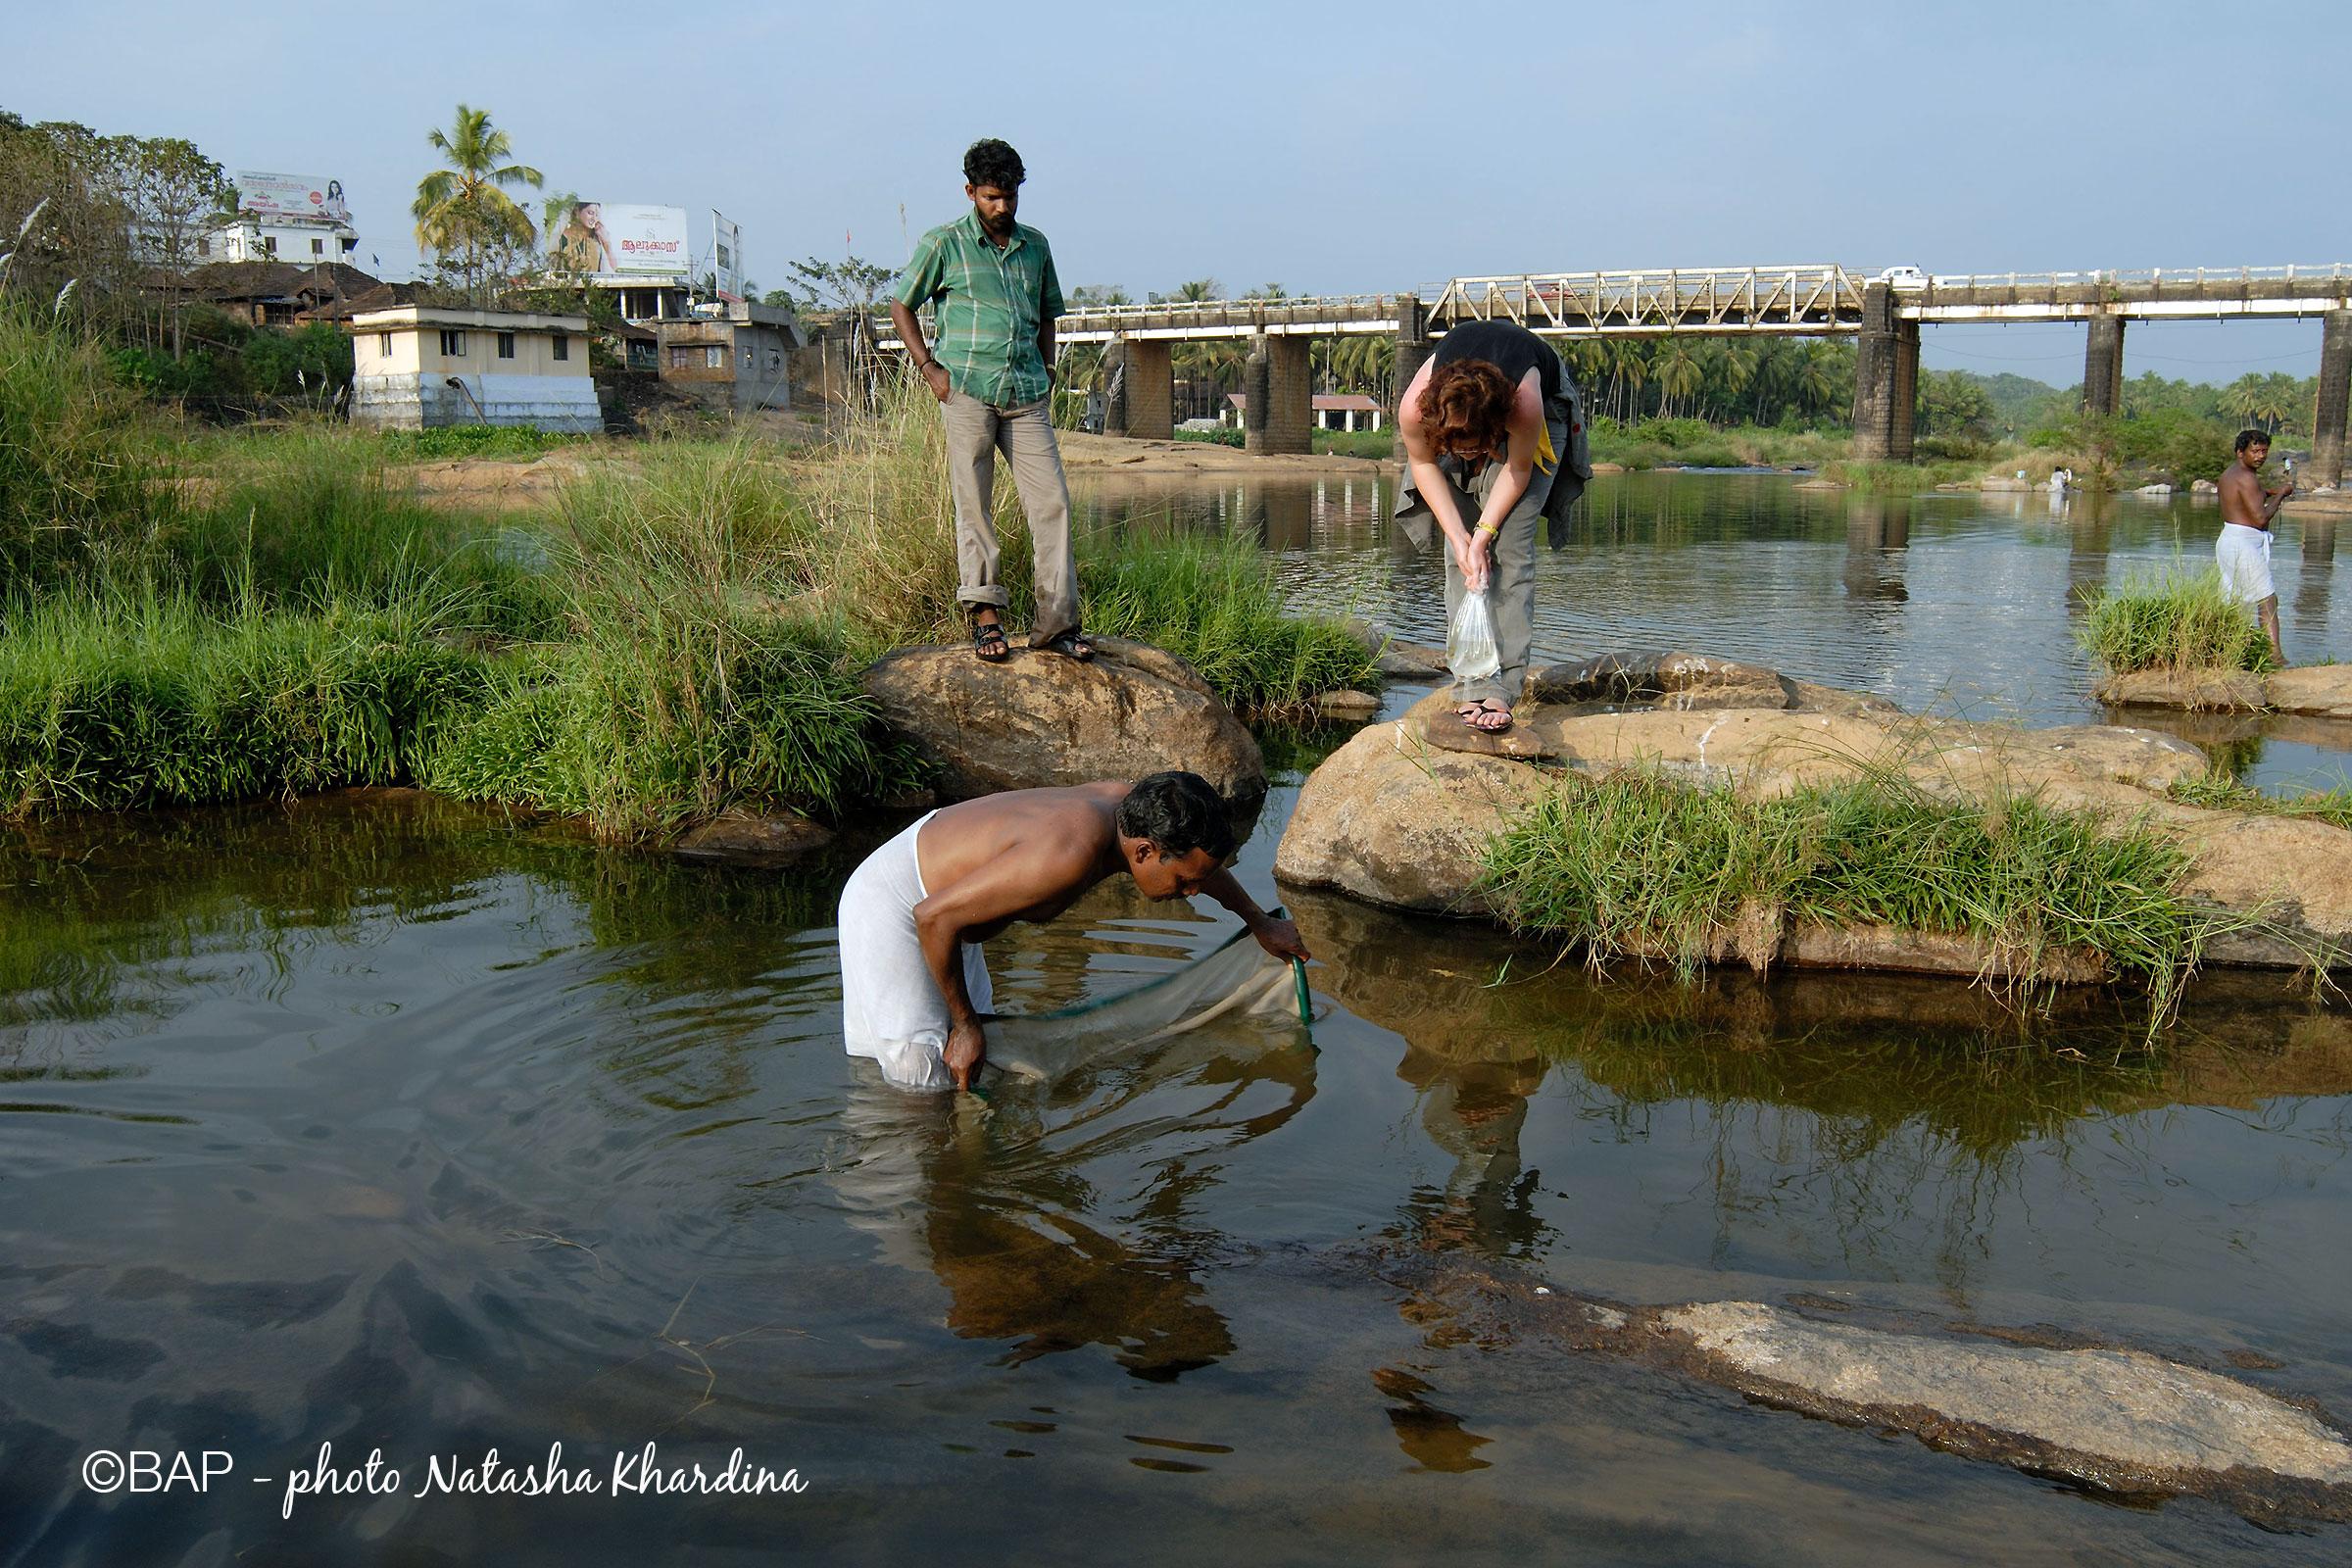 Tuda river, Kerala. ©BAP, photo N. Khardina